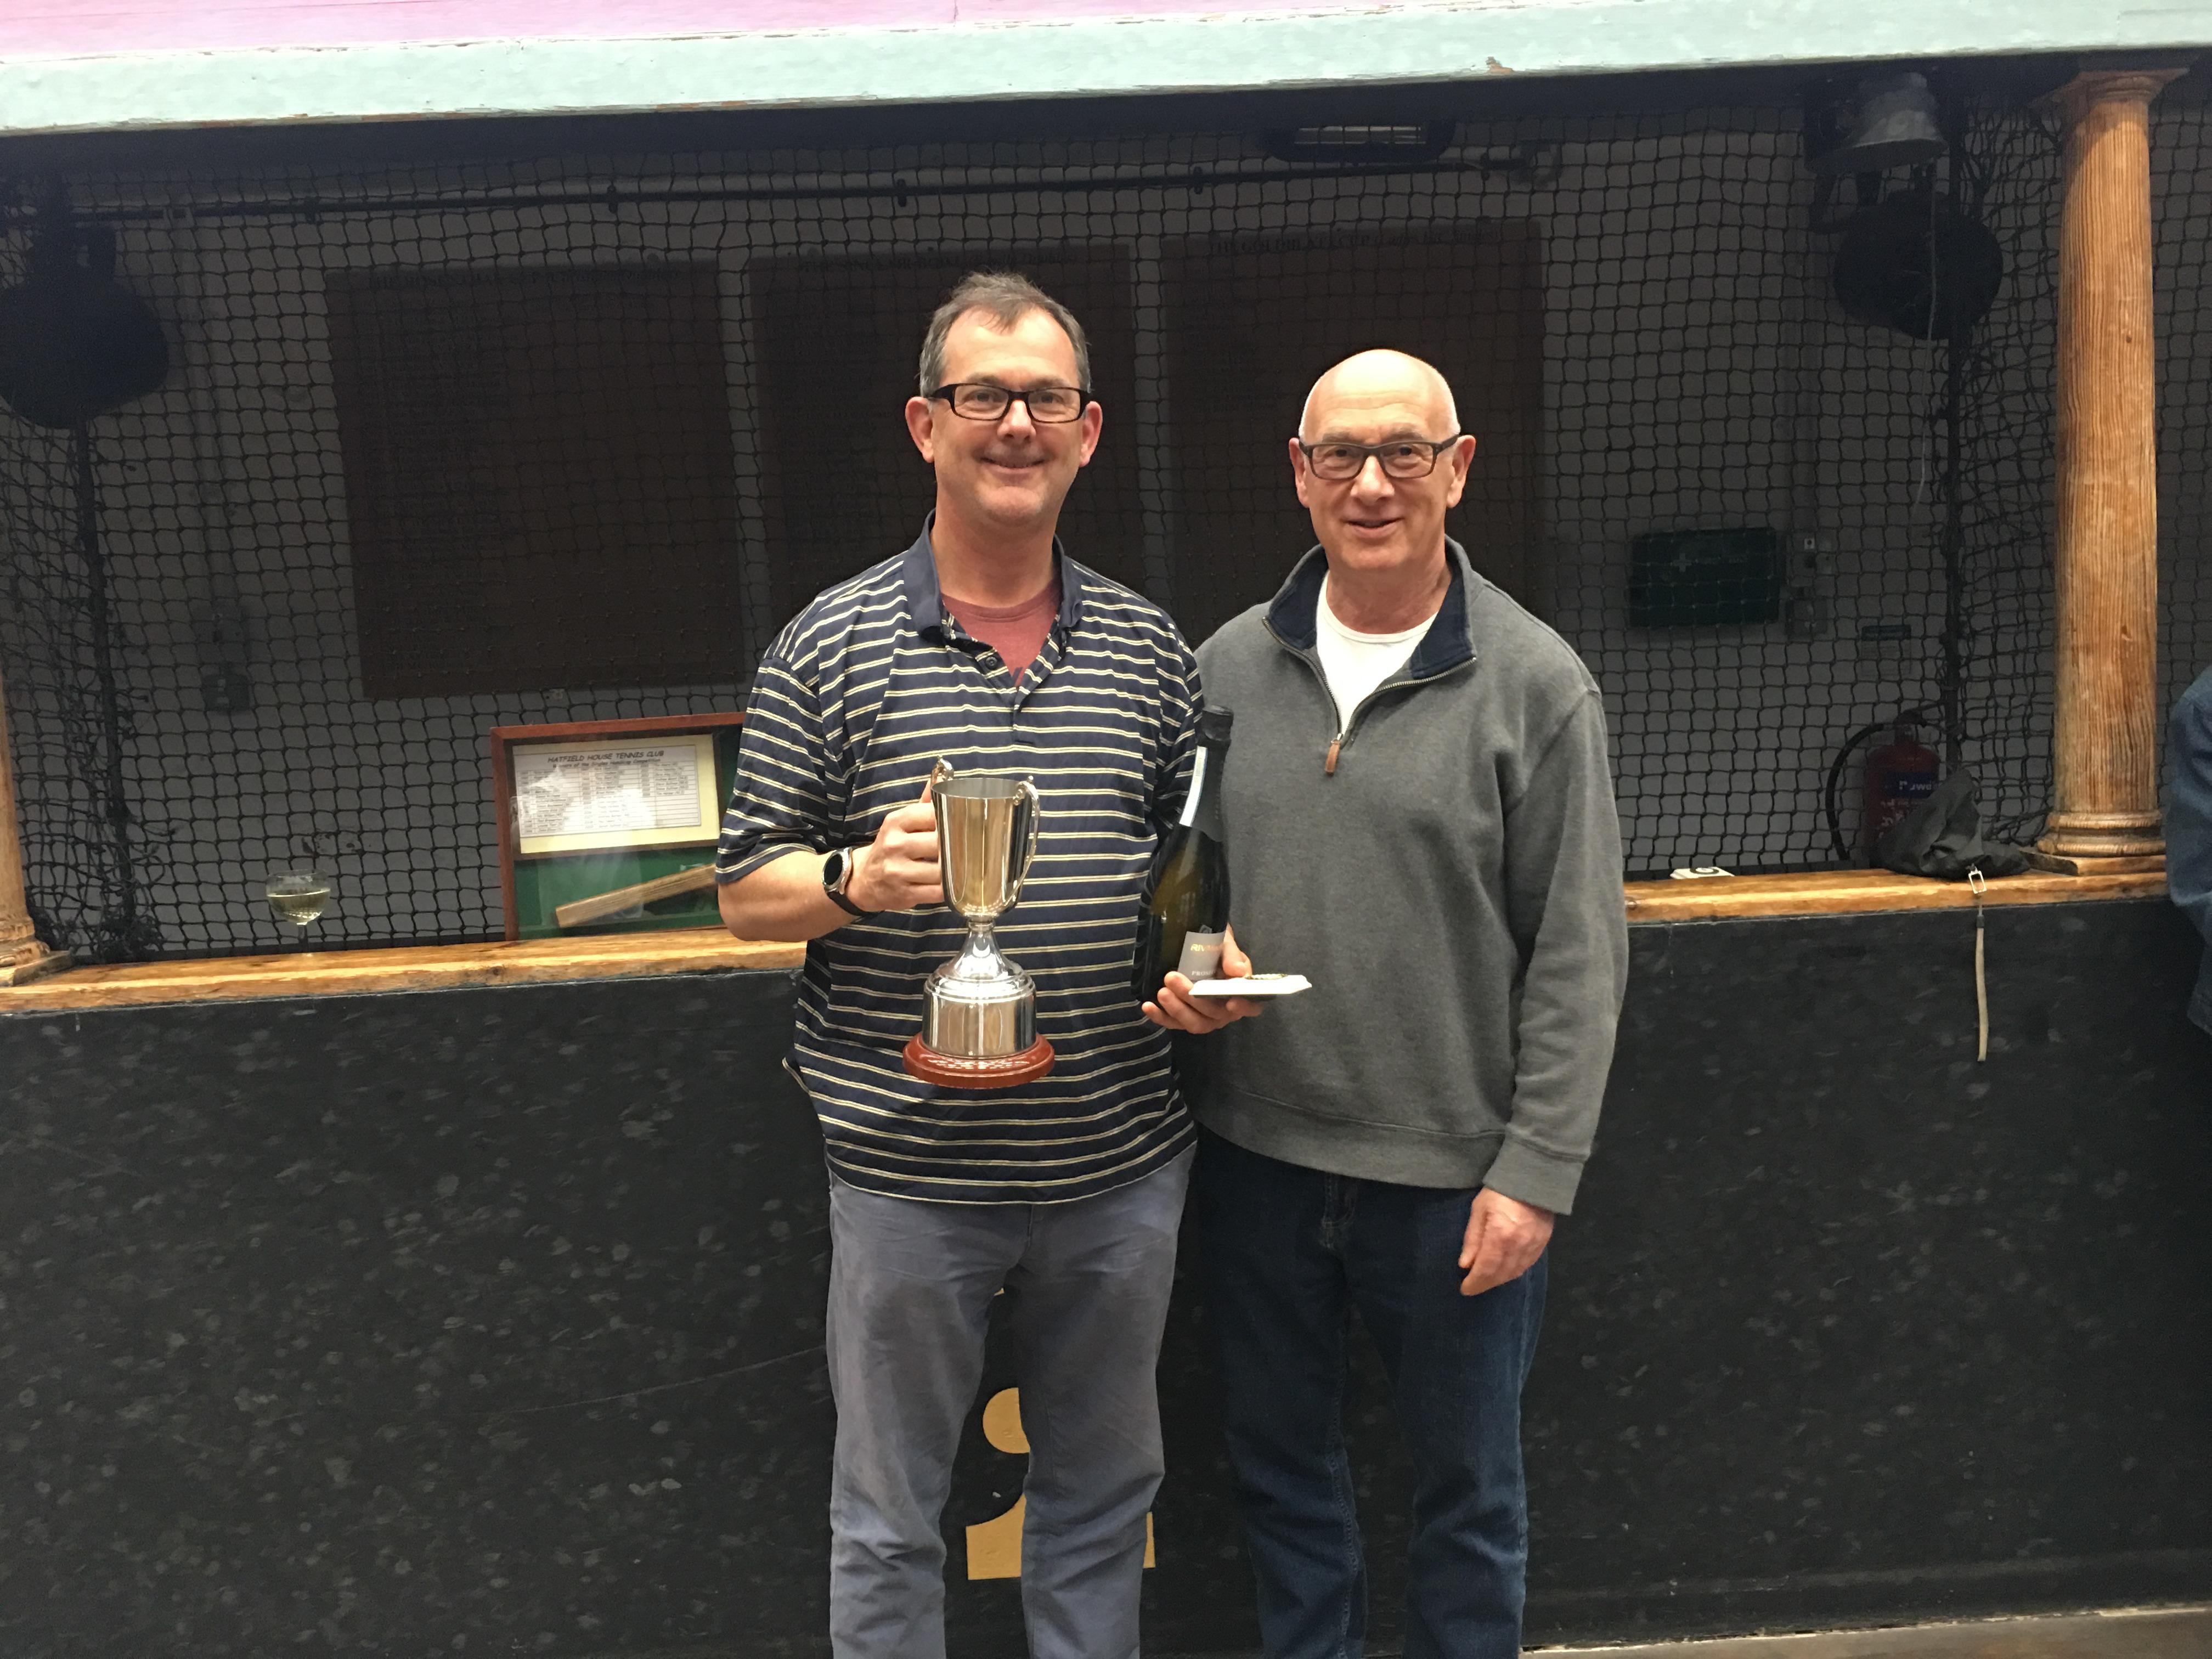 Hertford Cup Div 3 - 2017